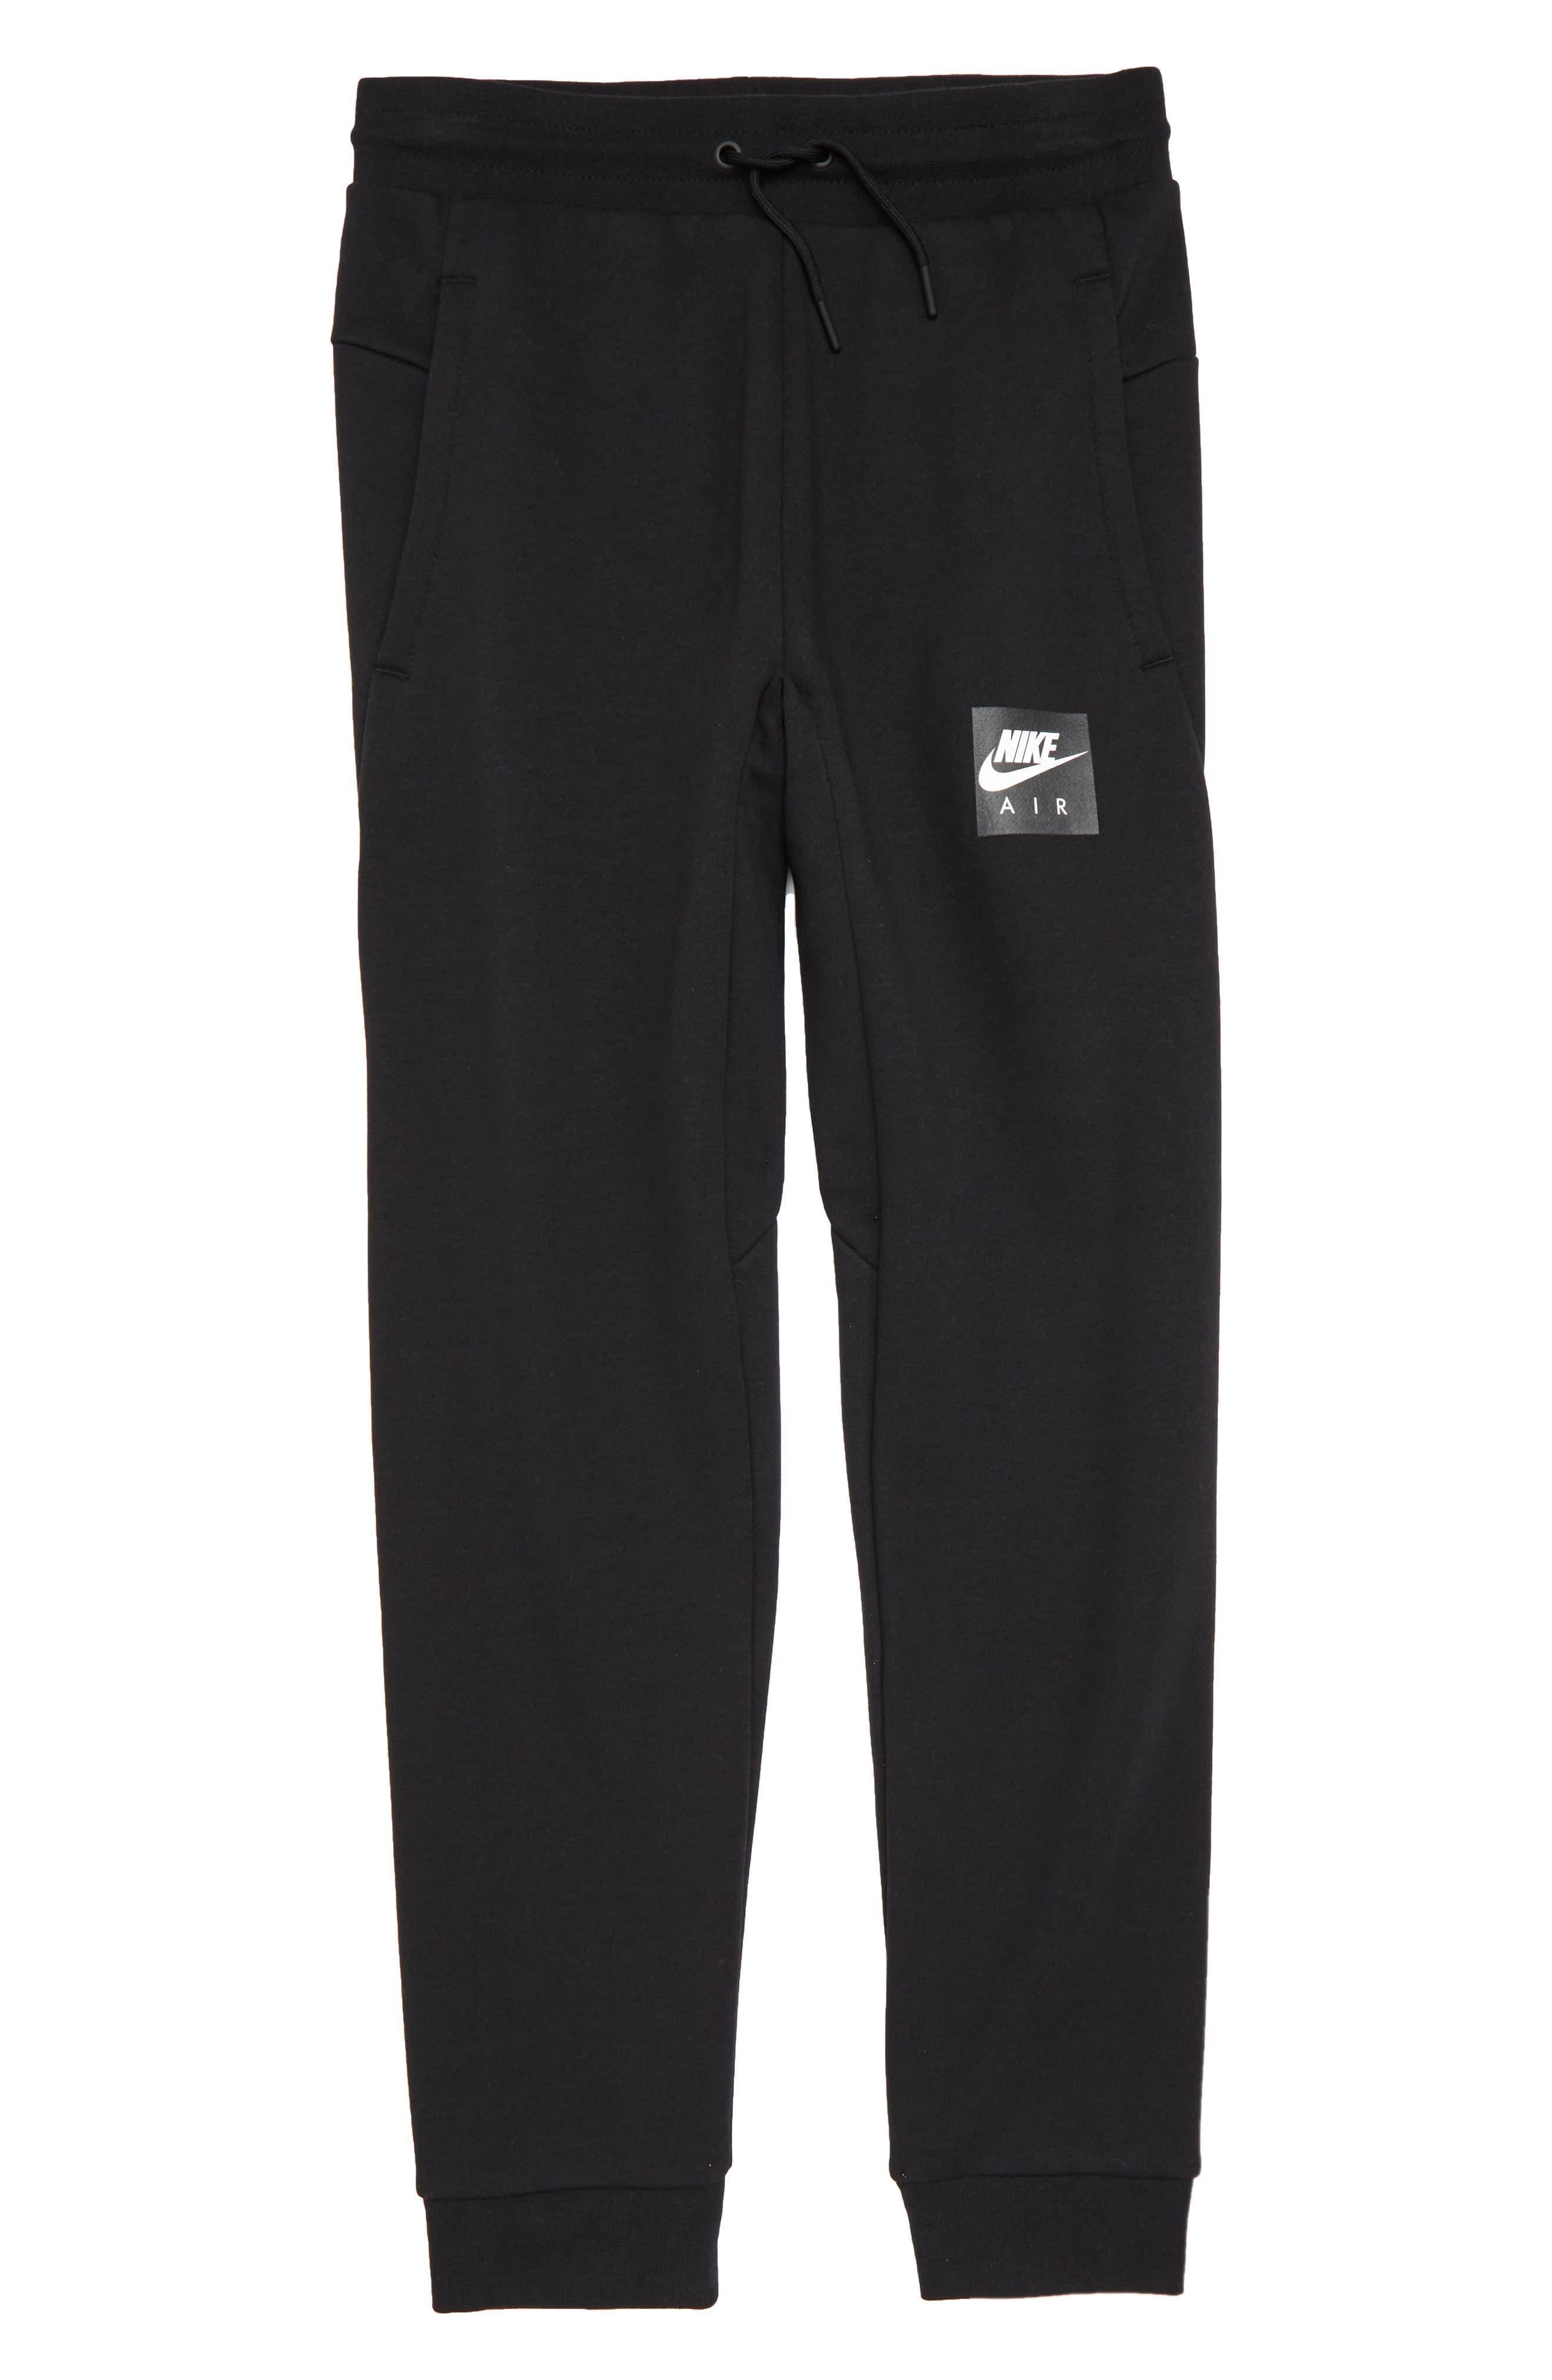 Boys Nike Air Fleece Jogger Pants